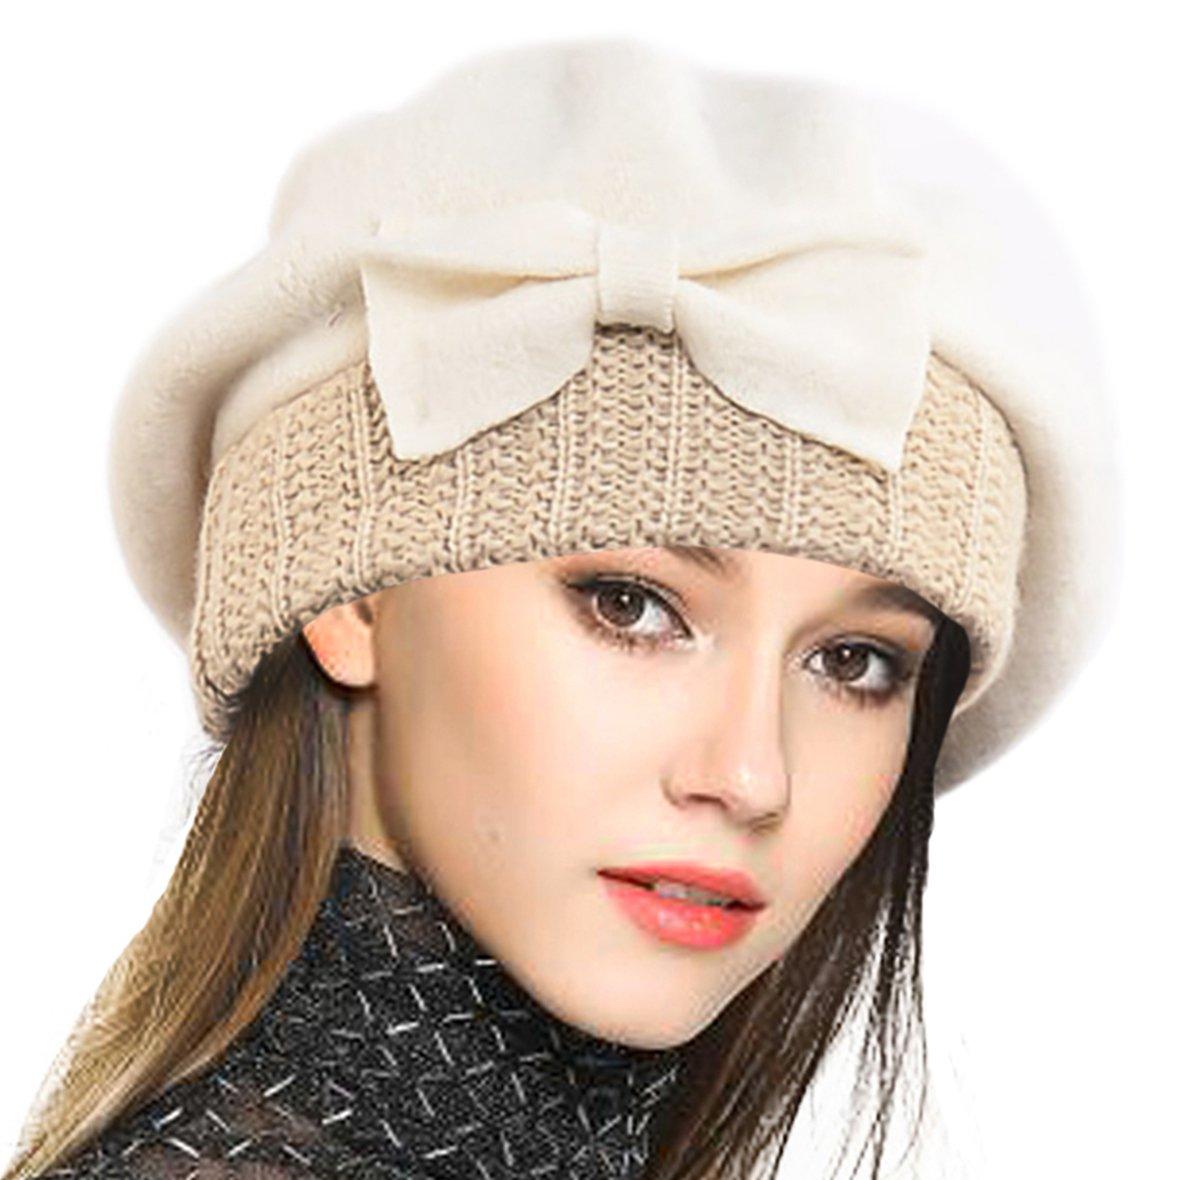 0ebbff1d3cac91 VECRY Women's 100% Wool Bucket Hat Felt Cloche Bow Dress Winter Hats  (Angora-Cream) at Amazon Women's Clothing store: